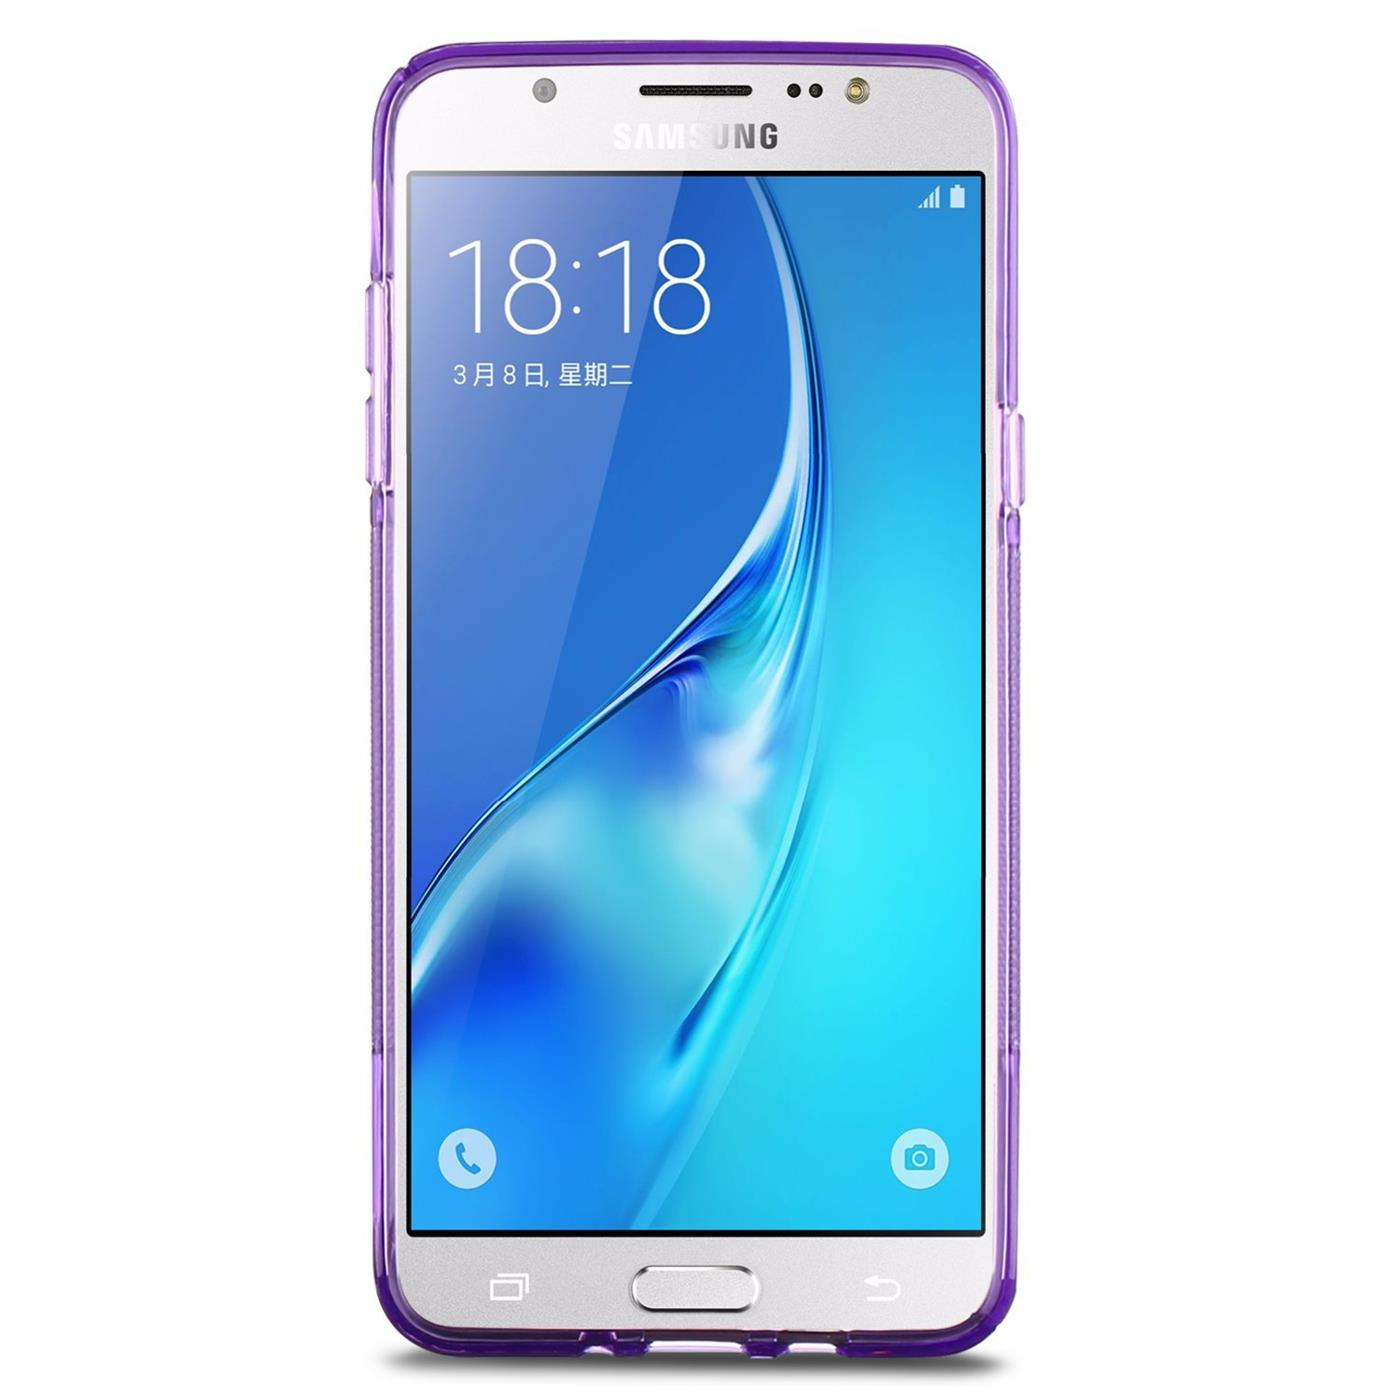 Samsung-Galaxy-j7-2016-Silikon-Gel-S-Line-Case-Cover-Duenn-Slim-Back-Bumper Indexbild 12